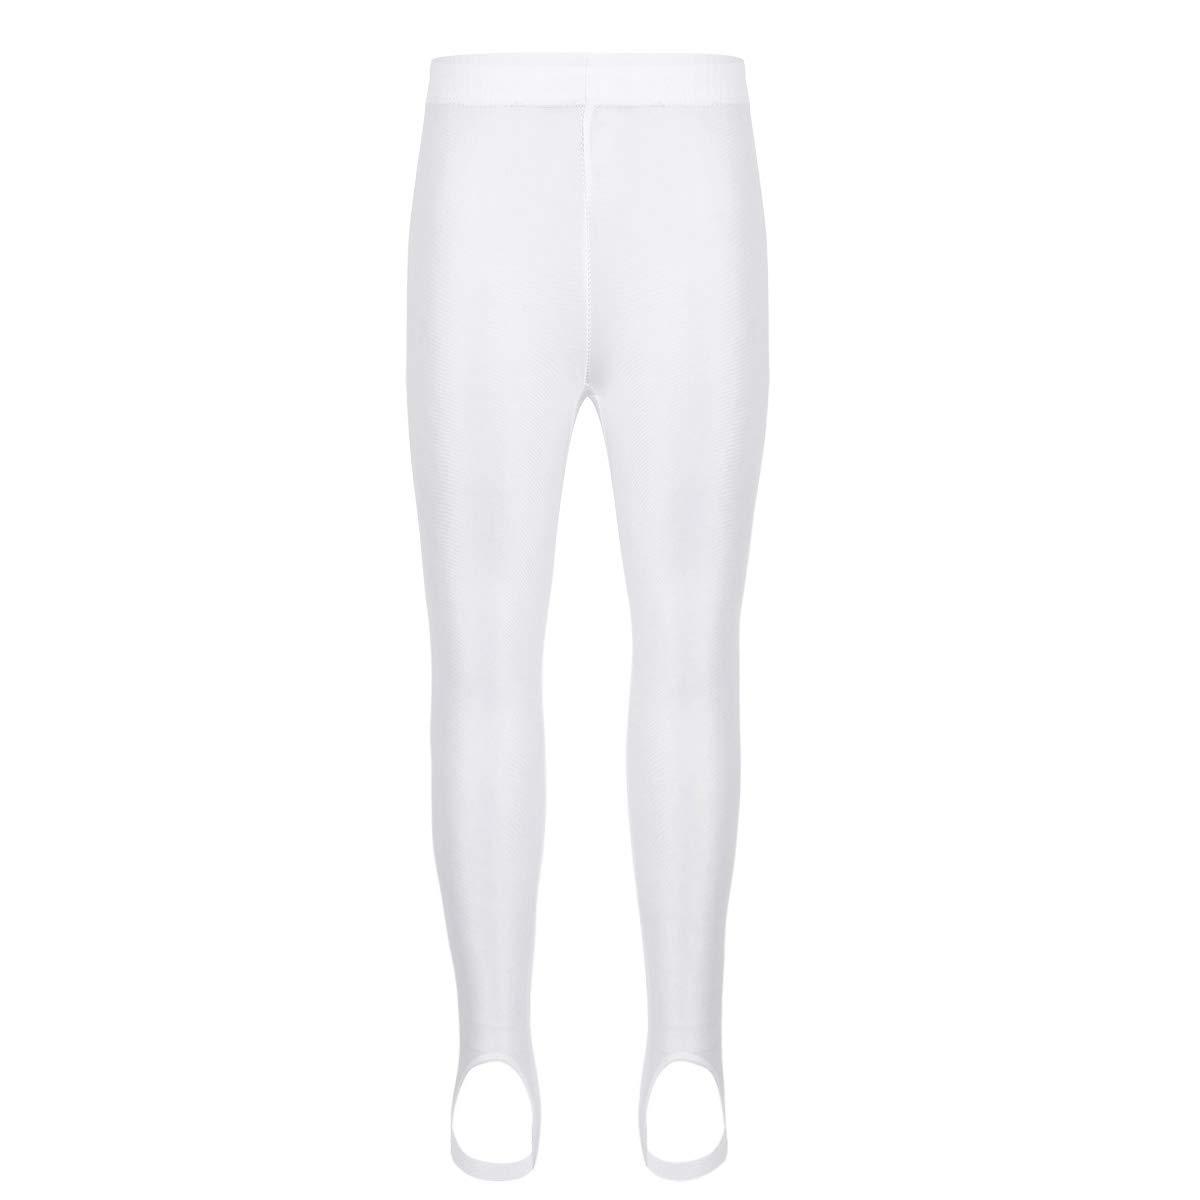 dPois Kids Boys Girls' Stirrup Pants Gymnastics Workout Yoga Stretch Leggings Basic Dance Stockings Tights White 5-6